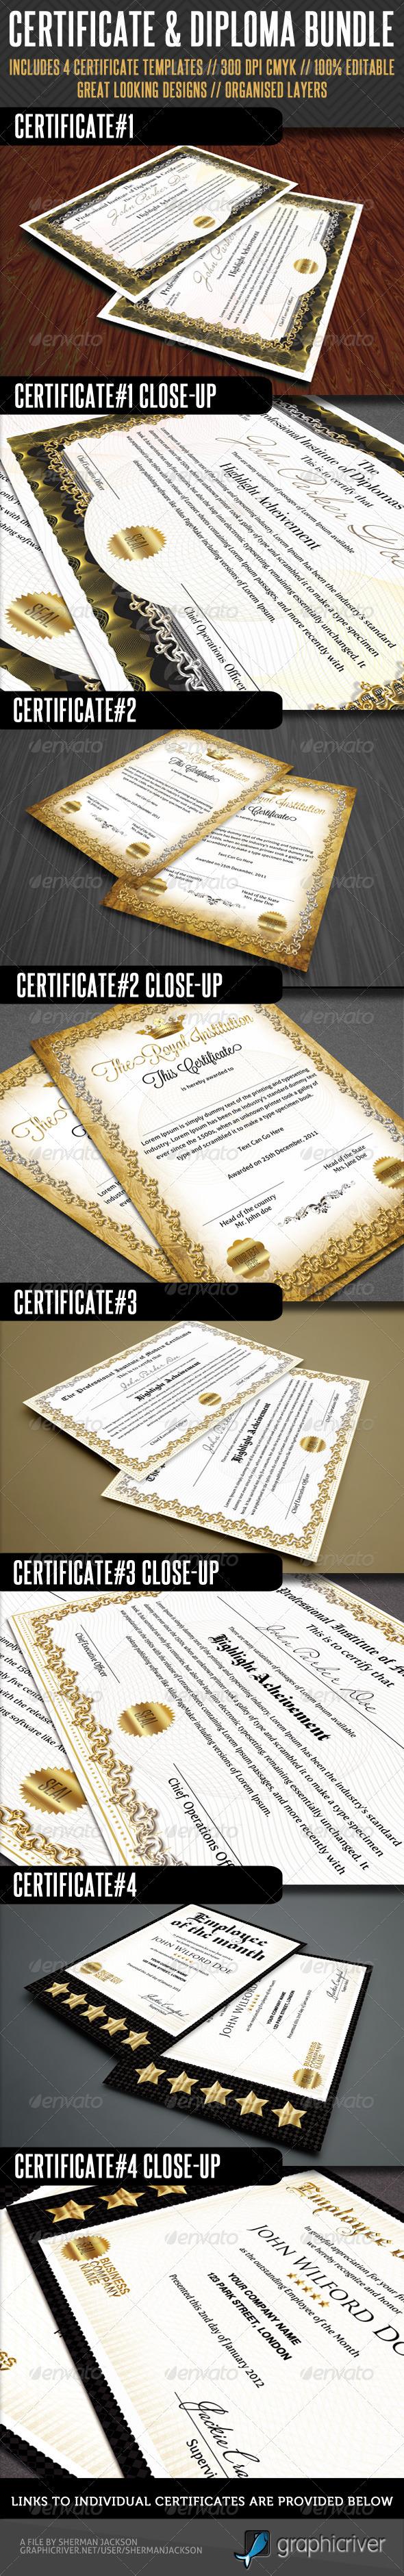 Premium Certificate Bundle - GraphicRiver Item for Sale